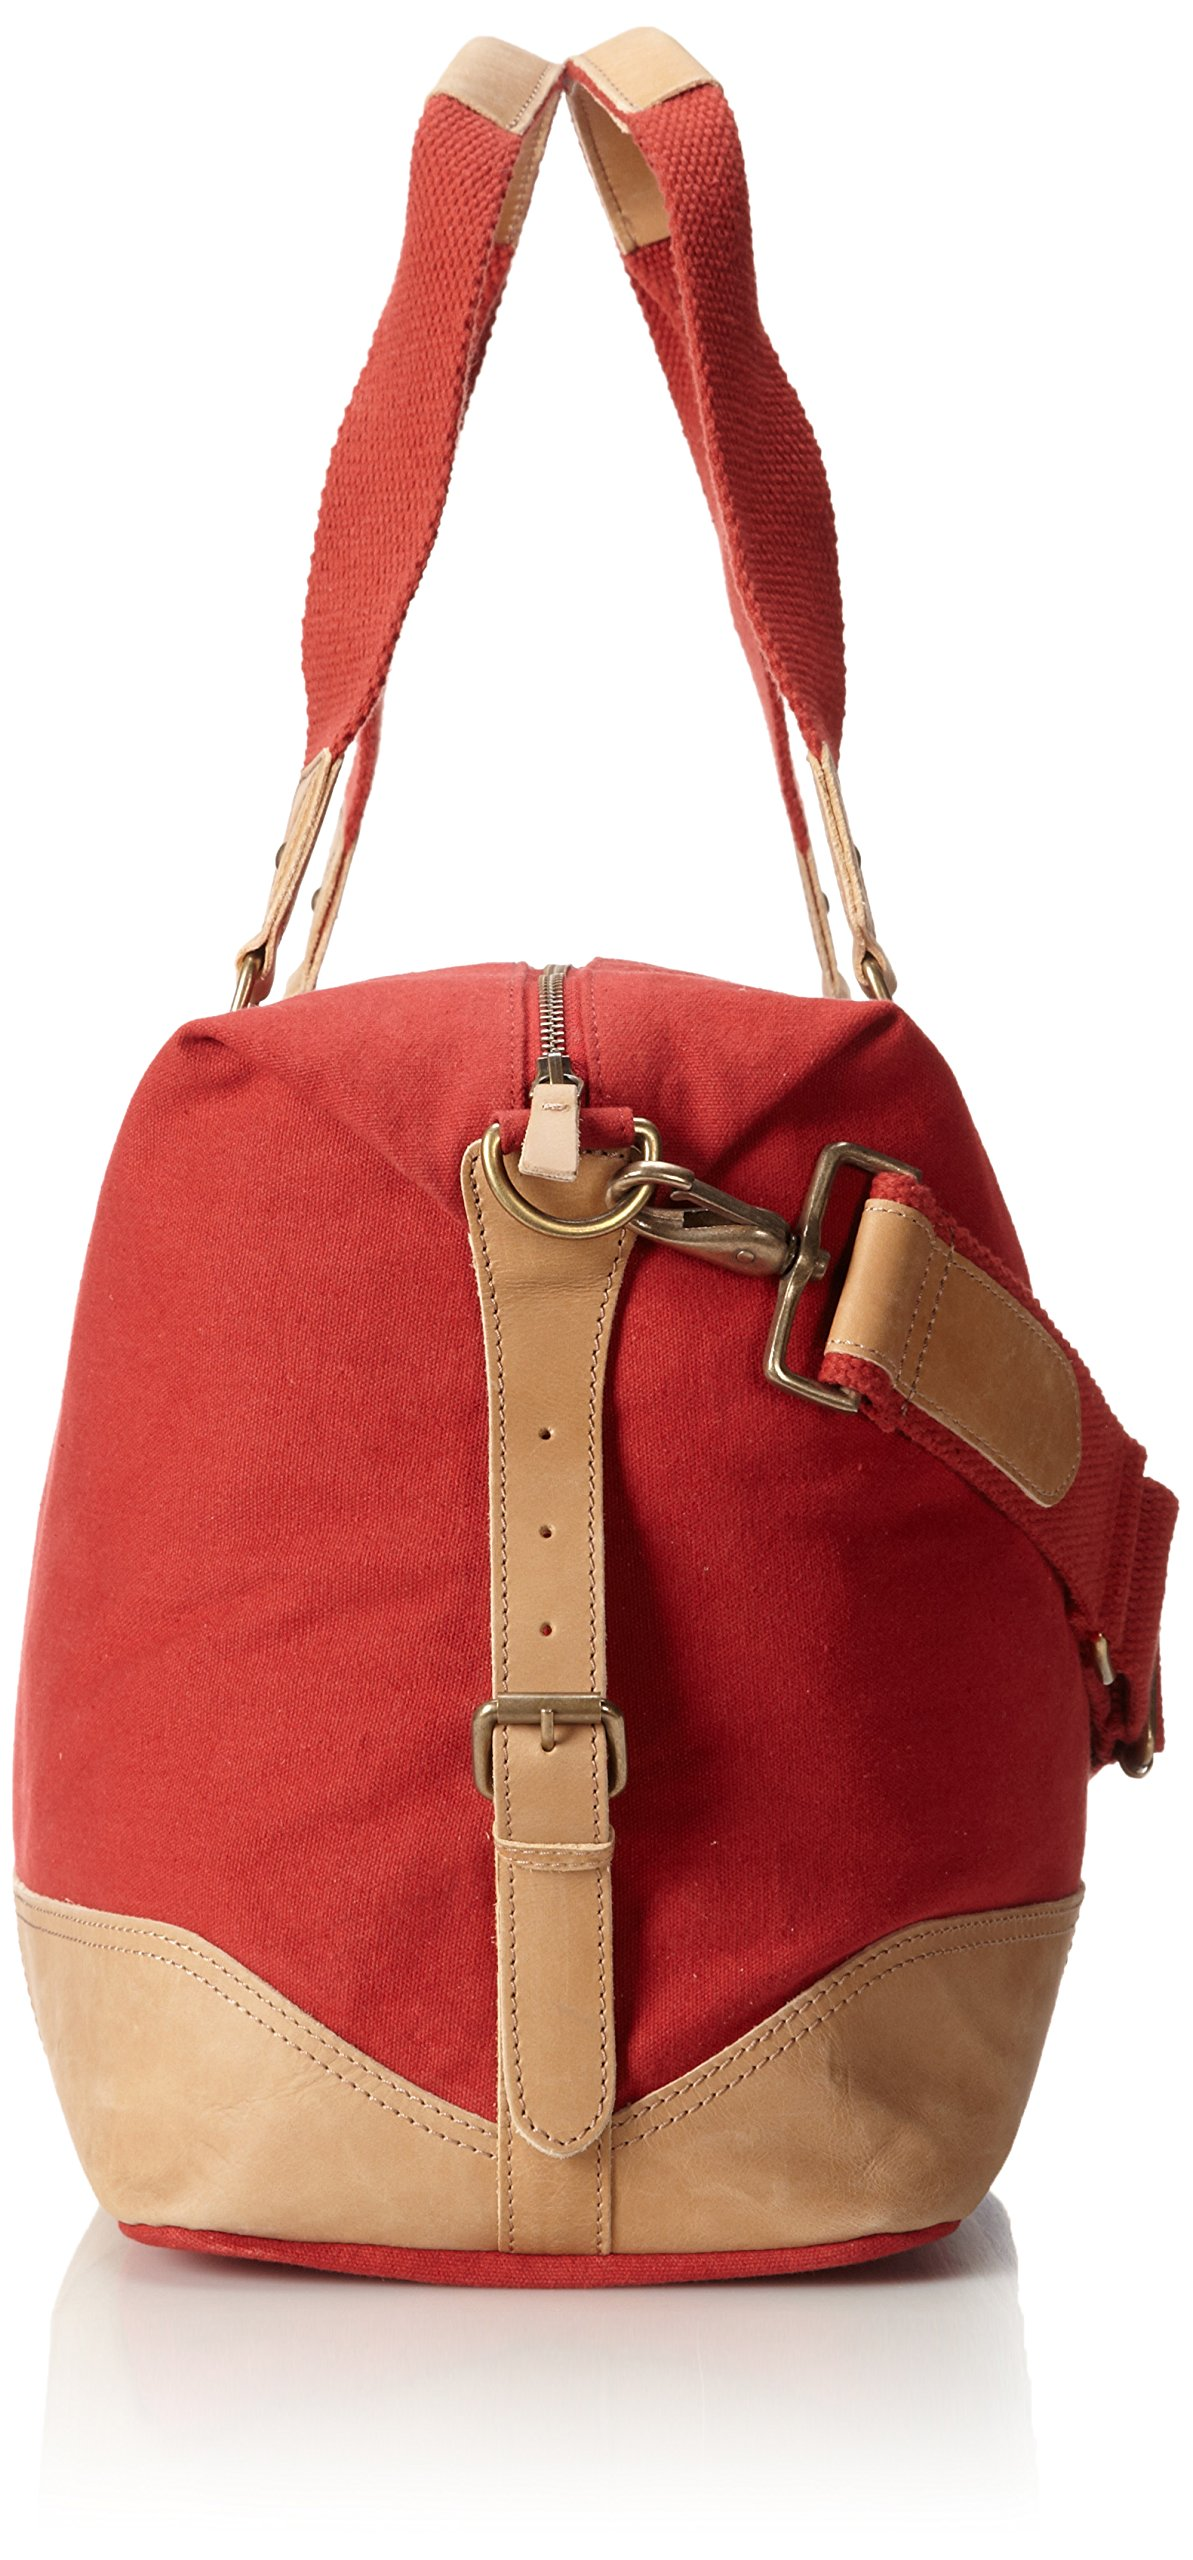 Original Penguin Men's Canvas Weekend Bag Duffel Bag, Pompeian Red, One Size by Original Penguin (Image #3)